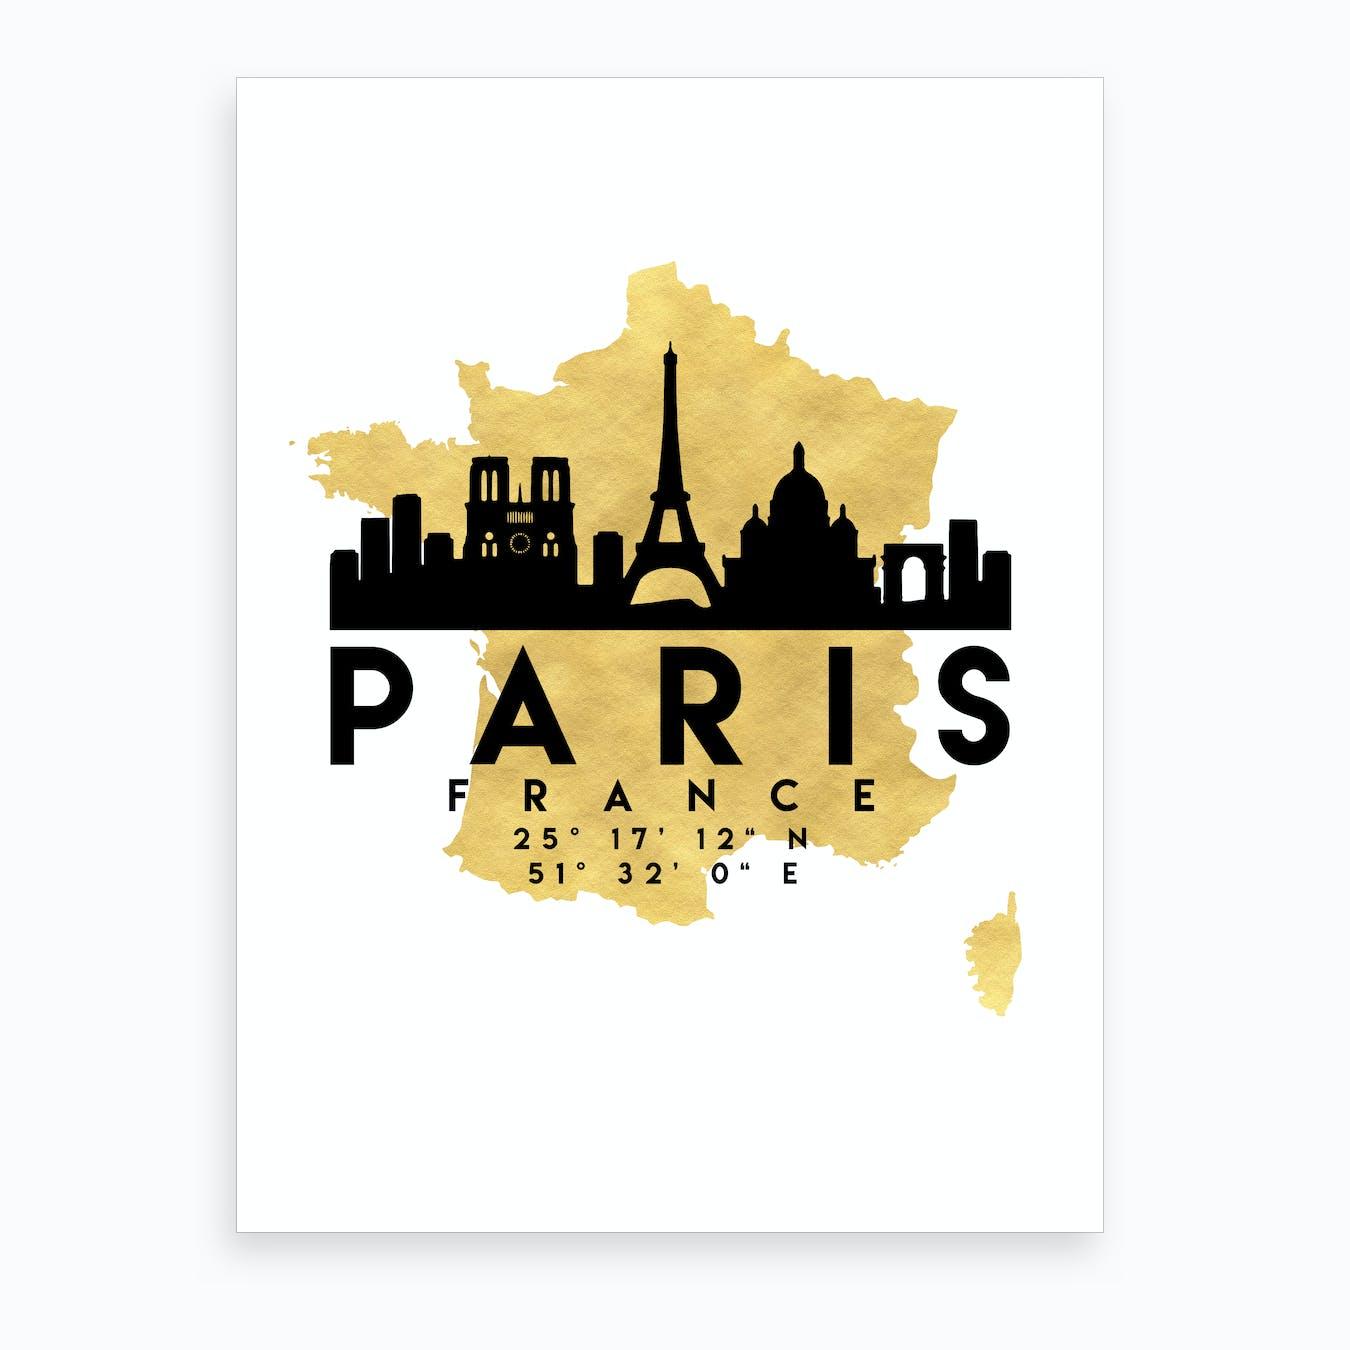 Paris France Silhouette City Skyline Map